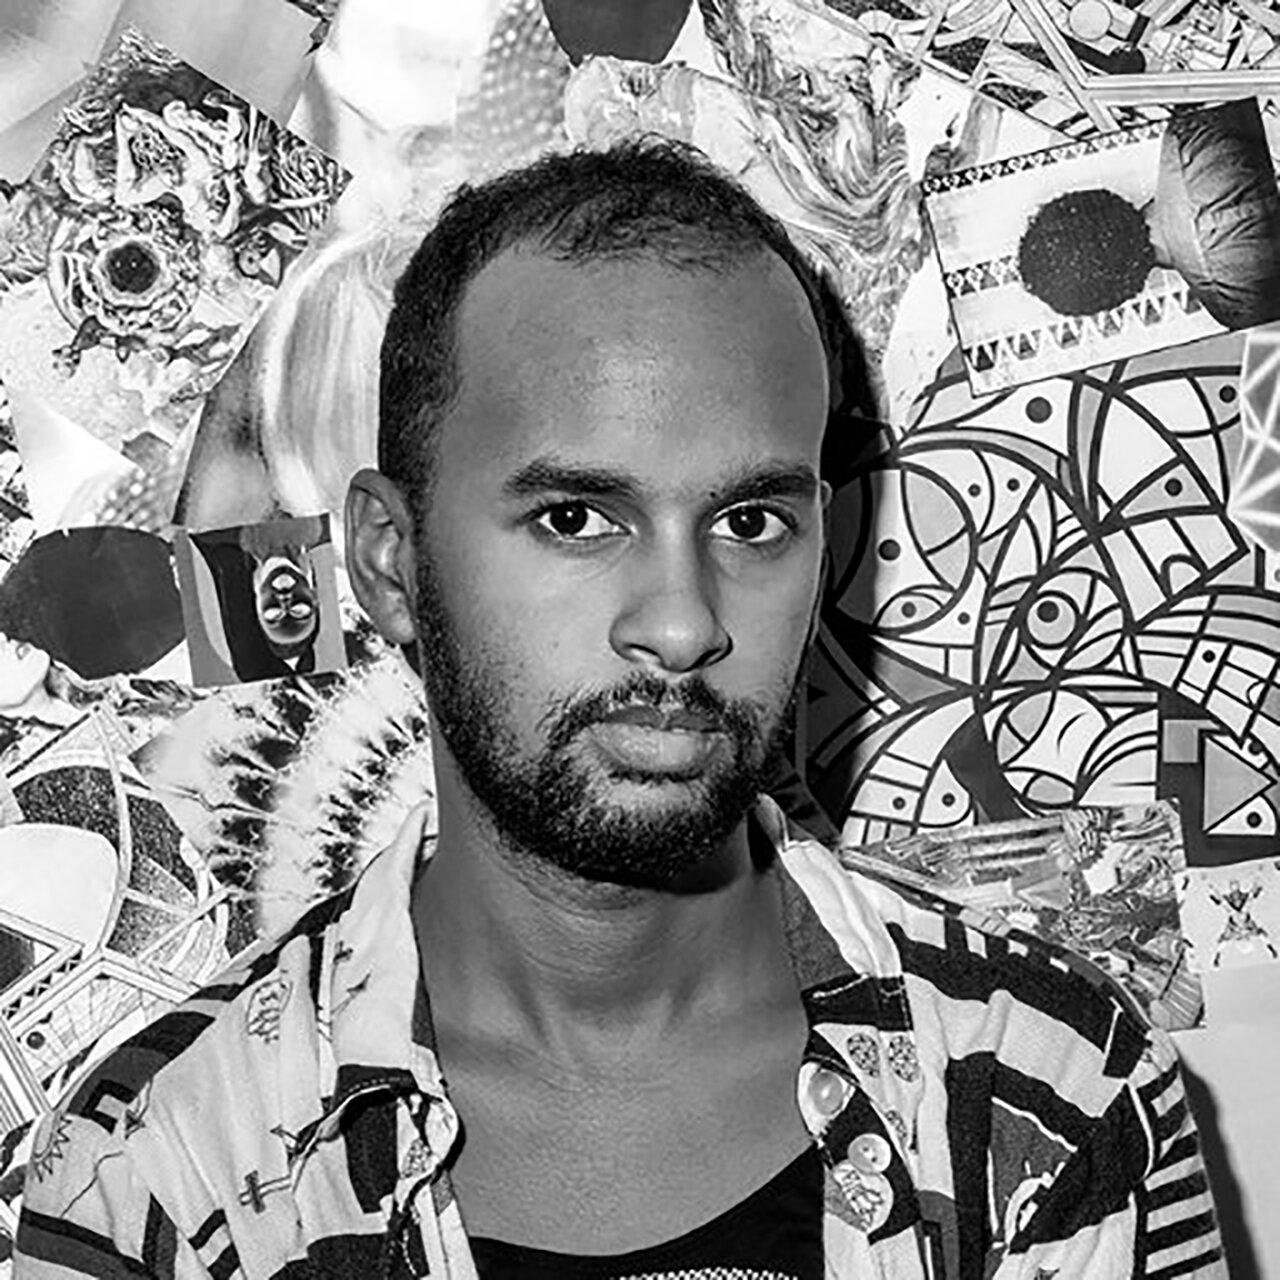 MUSTAFA SAEED Hargeisa, Somaliland/Somalia @EverydayAfrica  @themustafasaeed